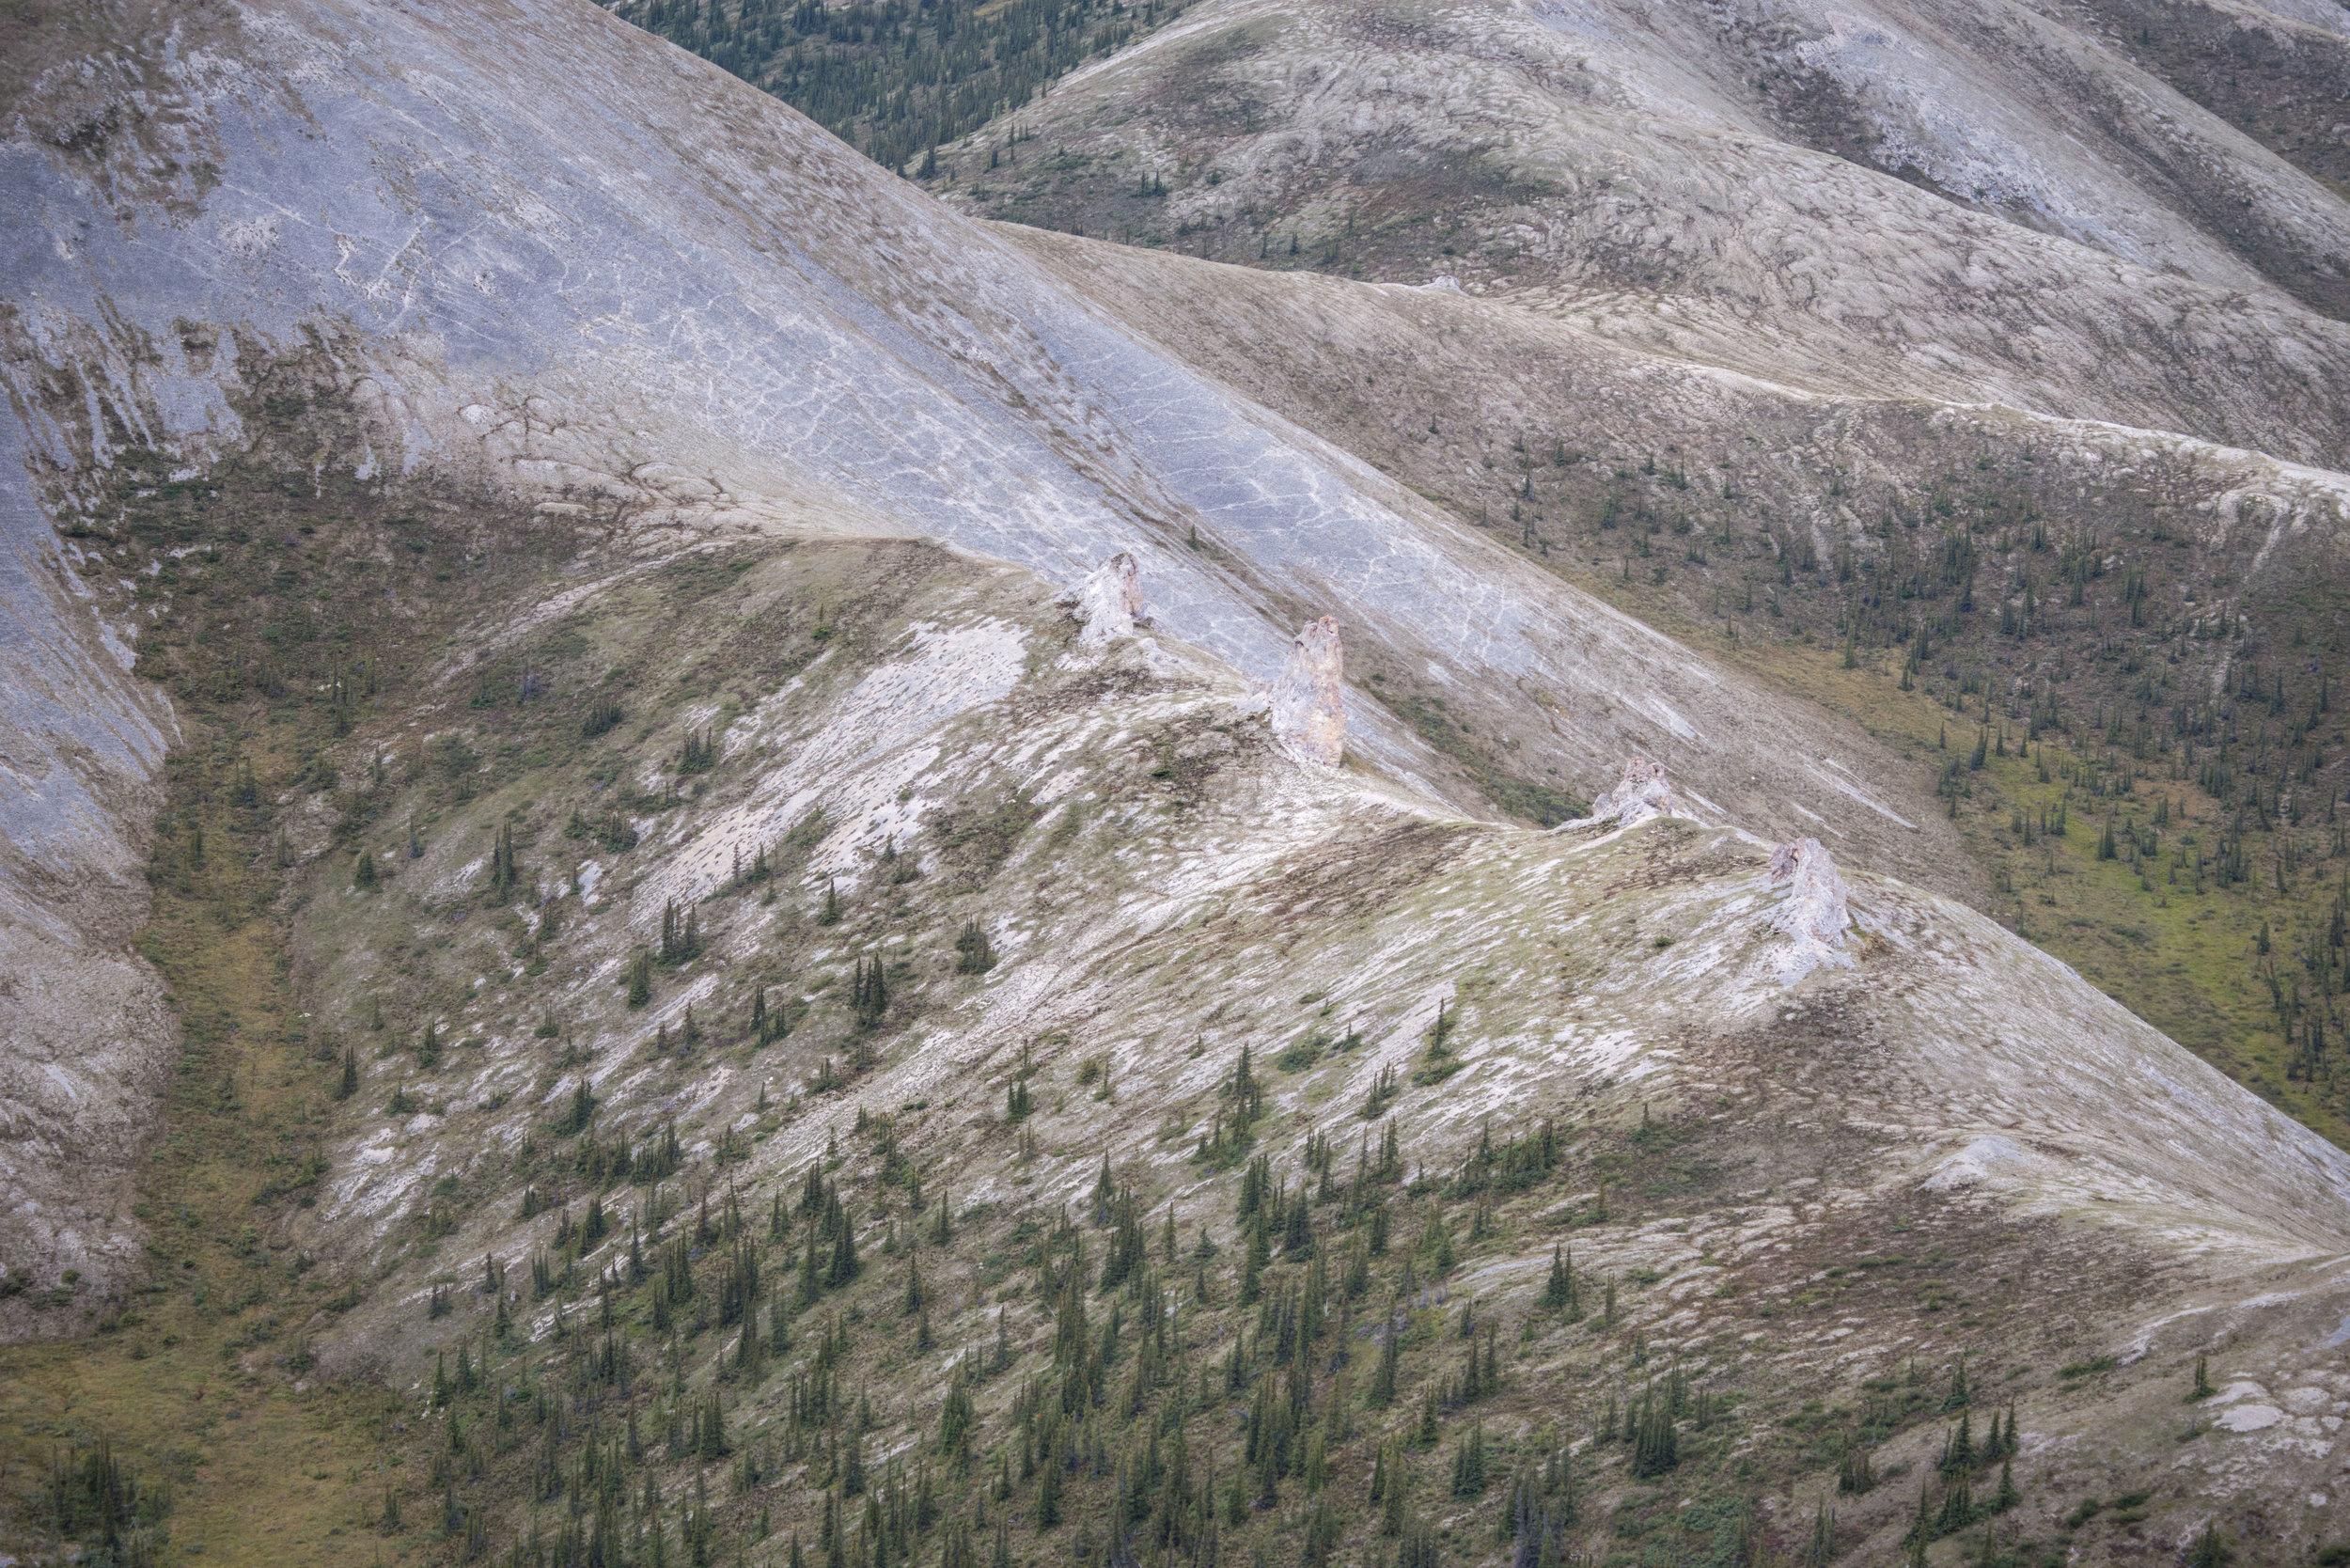 Limestone tors project above the ridgeline